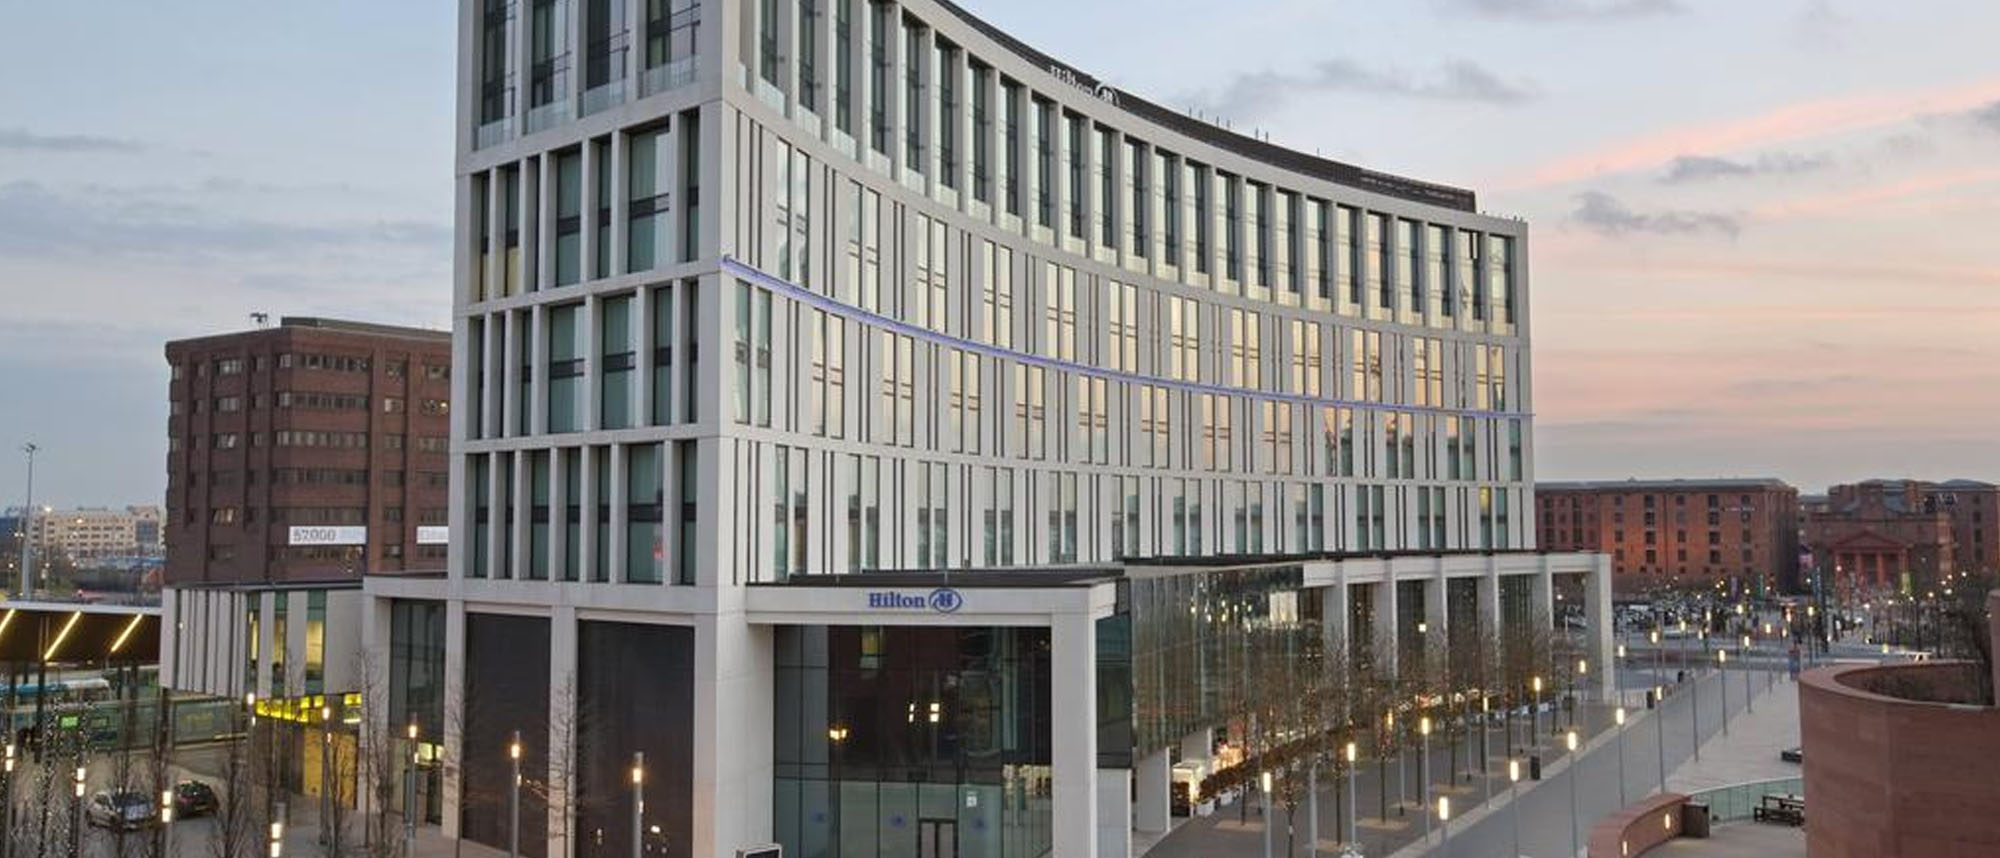 Hilton Liverpool Centre